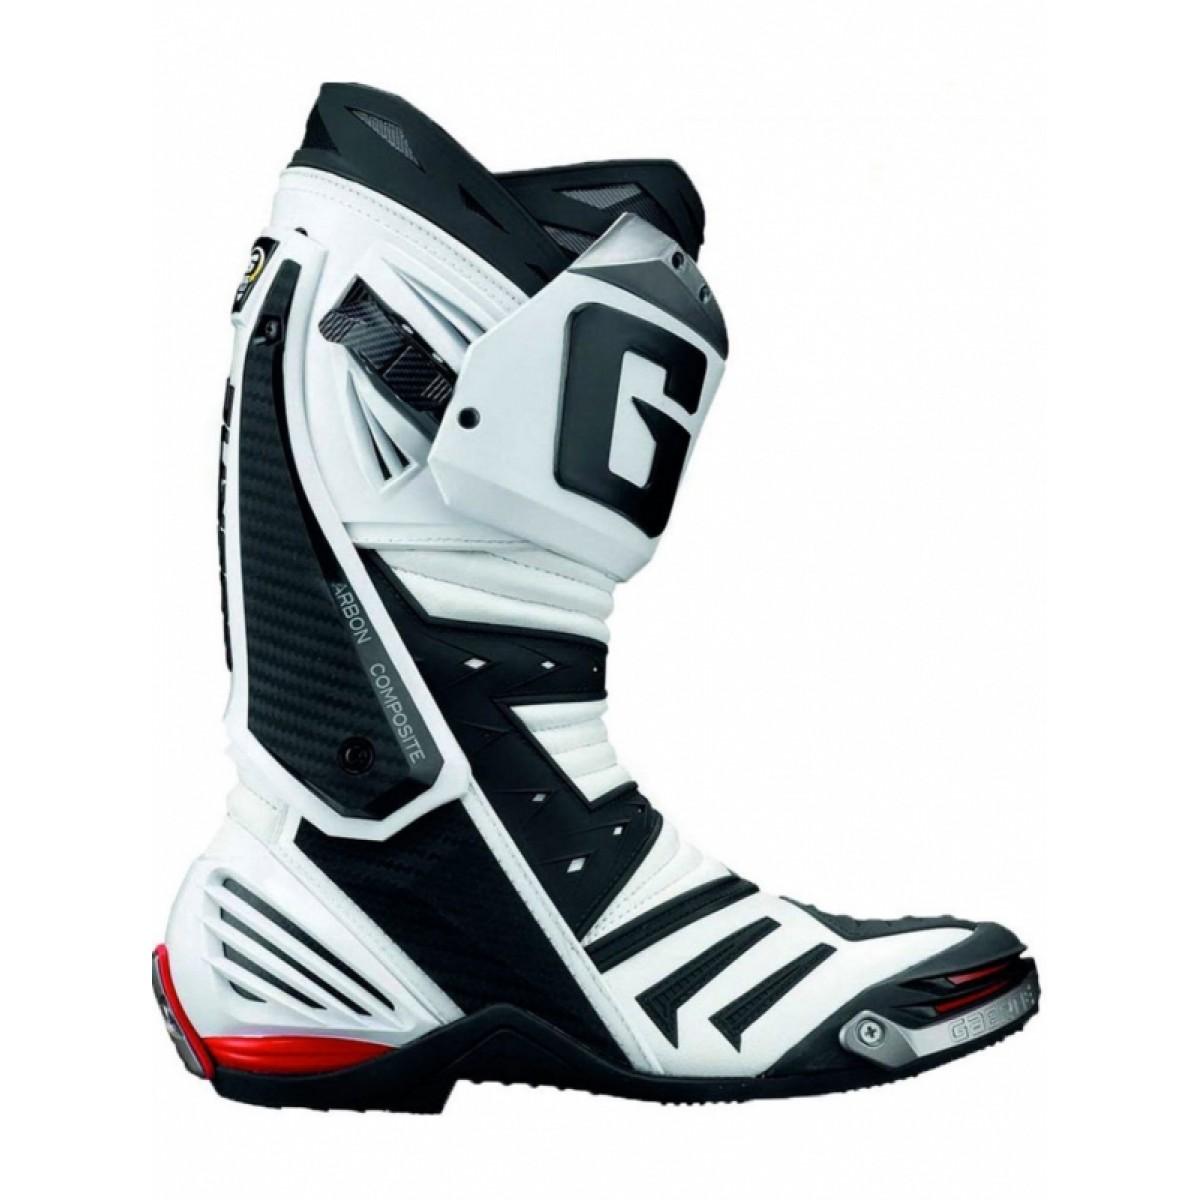 large_Gaerne-GP1-Air-Racing-3-1000x1340-1200x1200_0